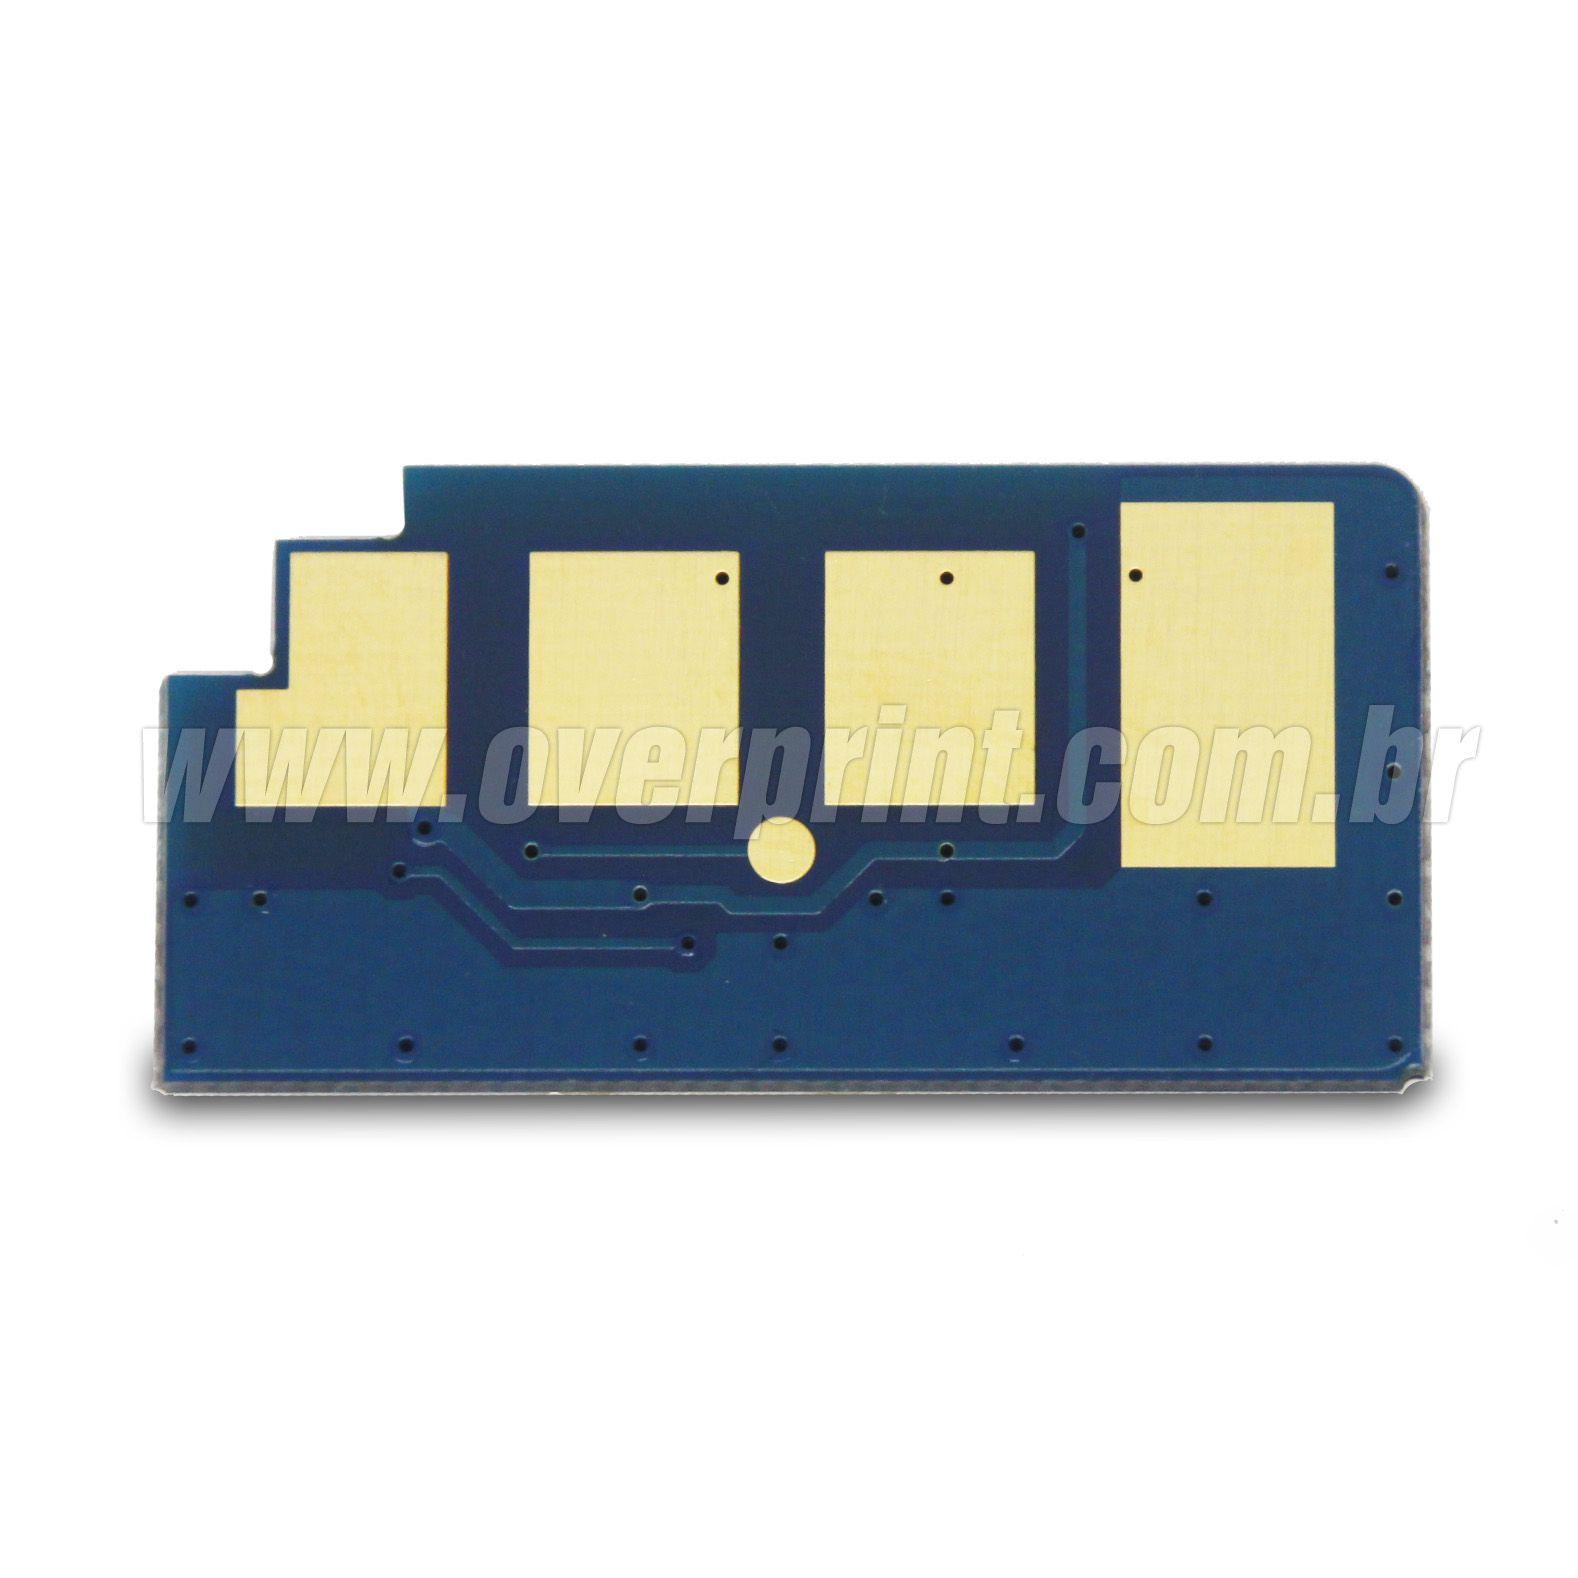 Chip toner Xerox Phaser 4600 / 4620 - Overprint